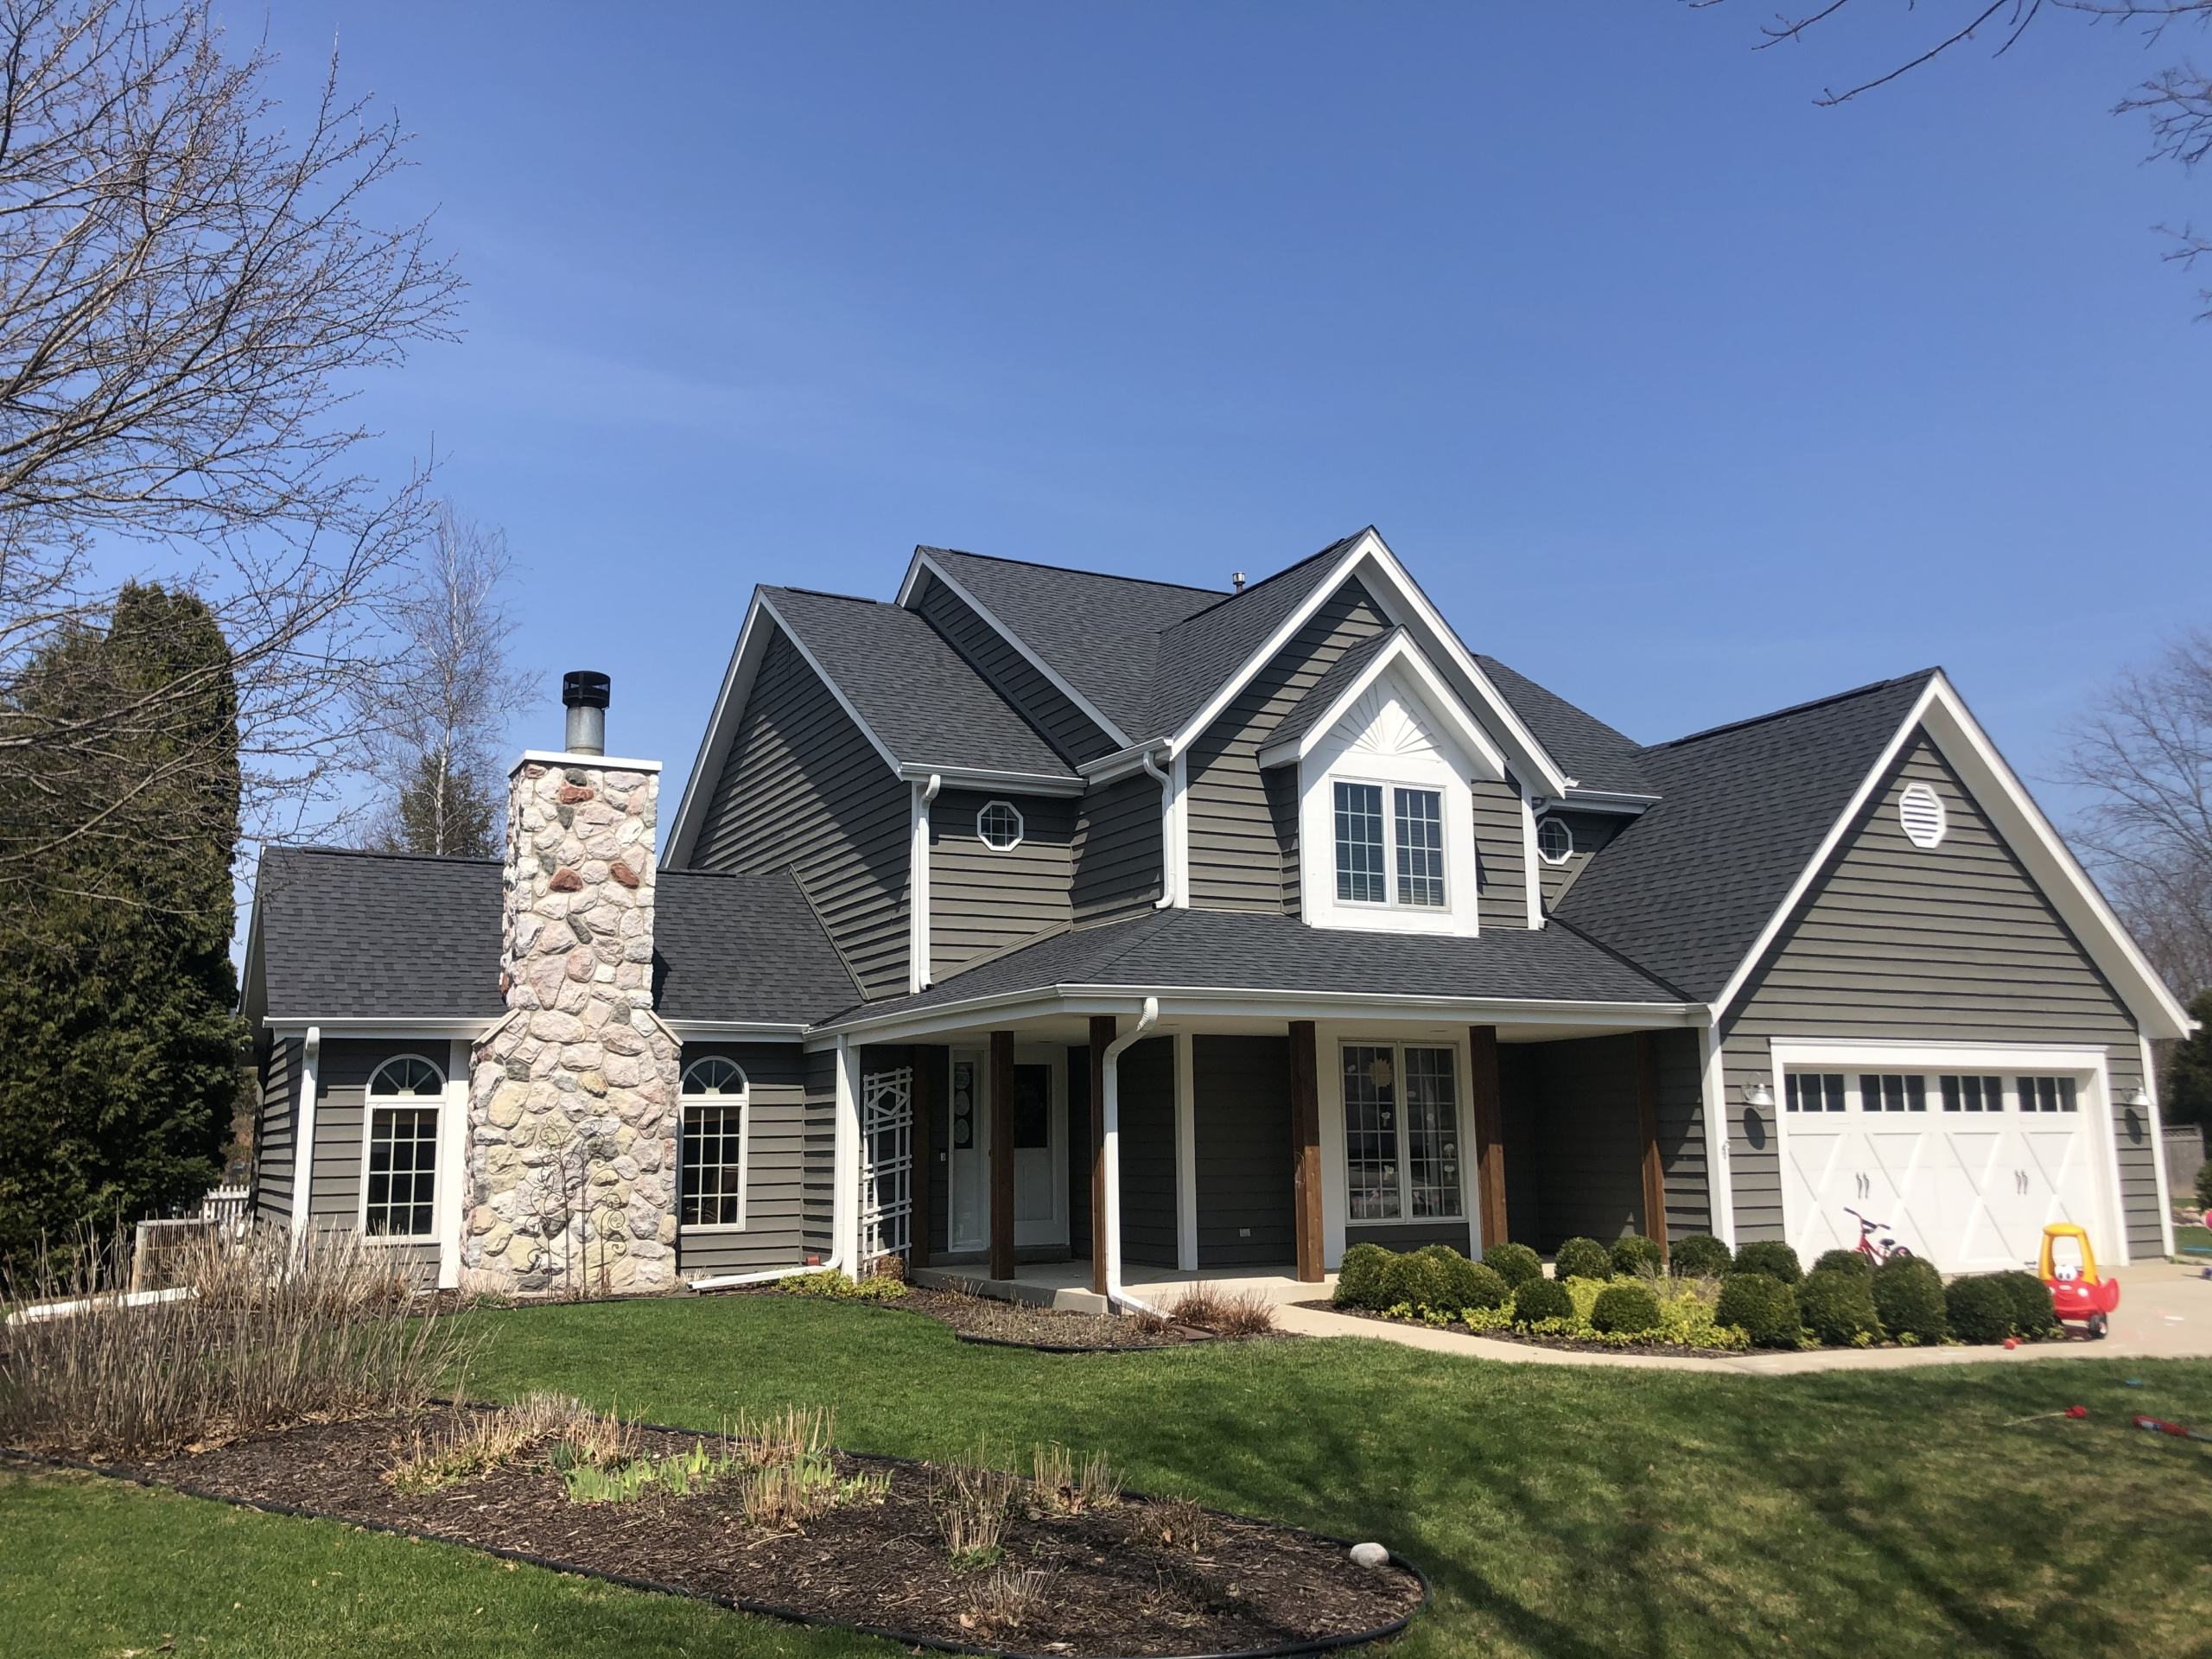 Wisconsin Roofing LLC | Residential | Mequon | New CertainTeed Landmark Pro | Moore Black Shingles